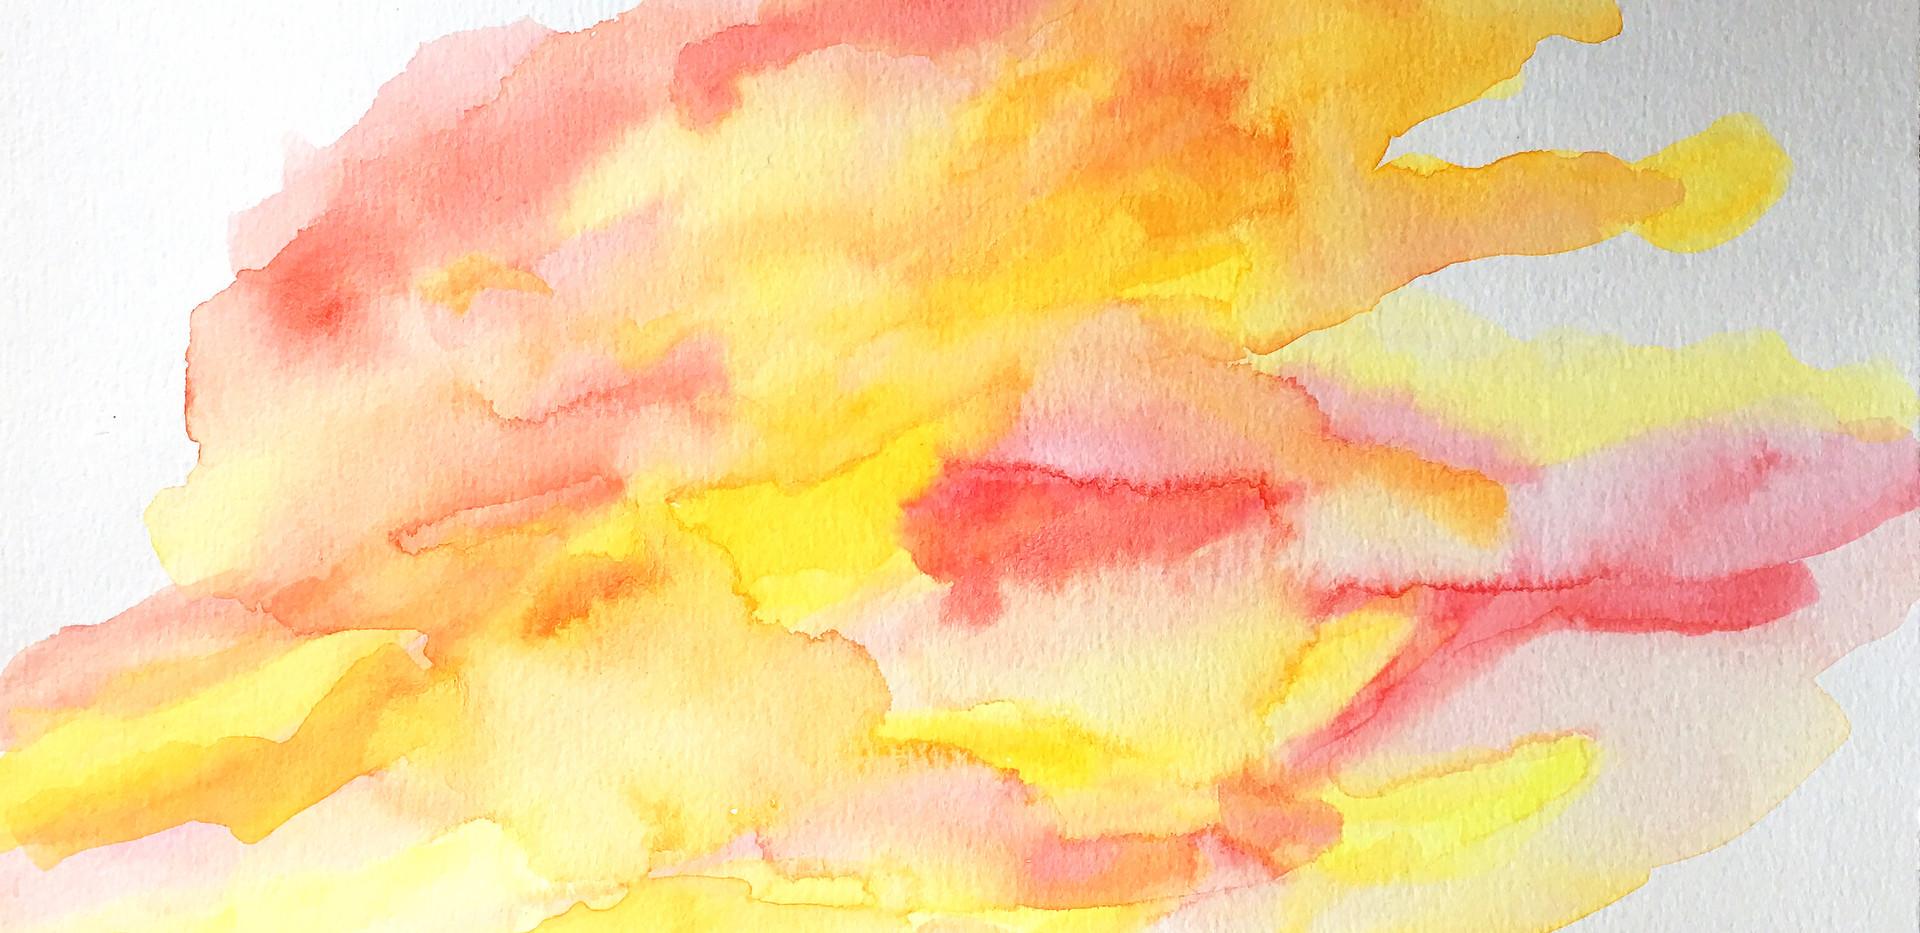 Karina Matheus - Burnt III (Arrival Series)